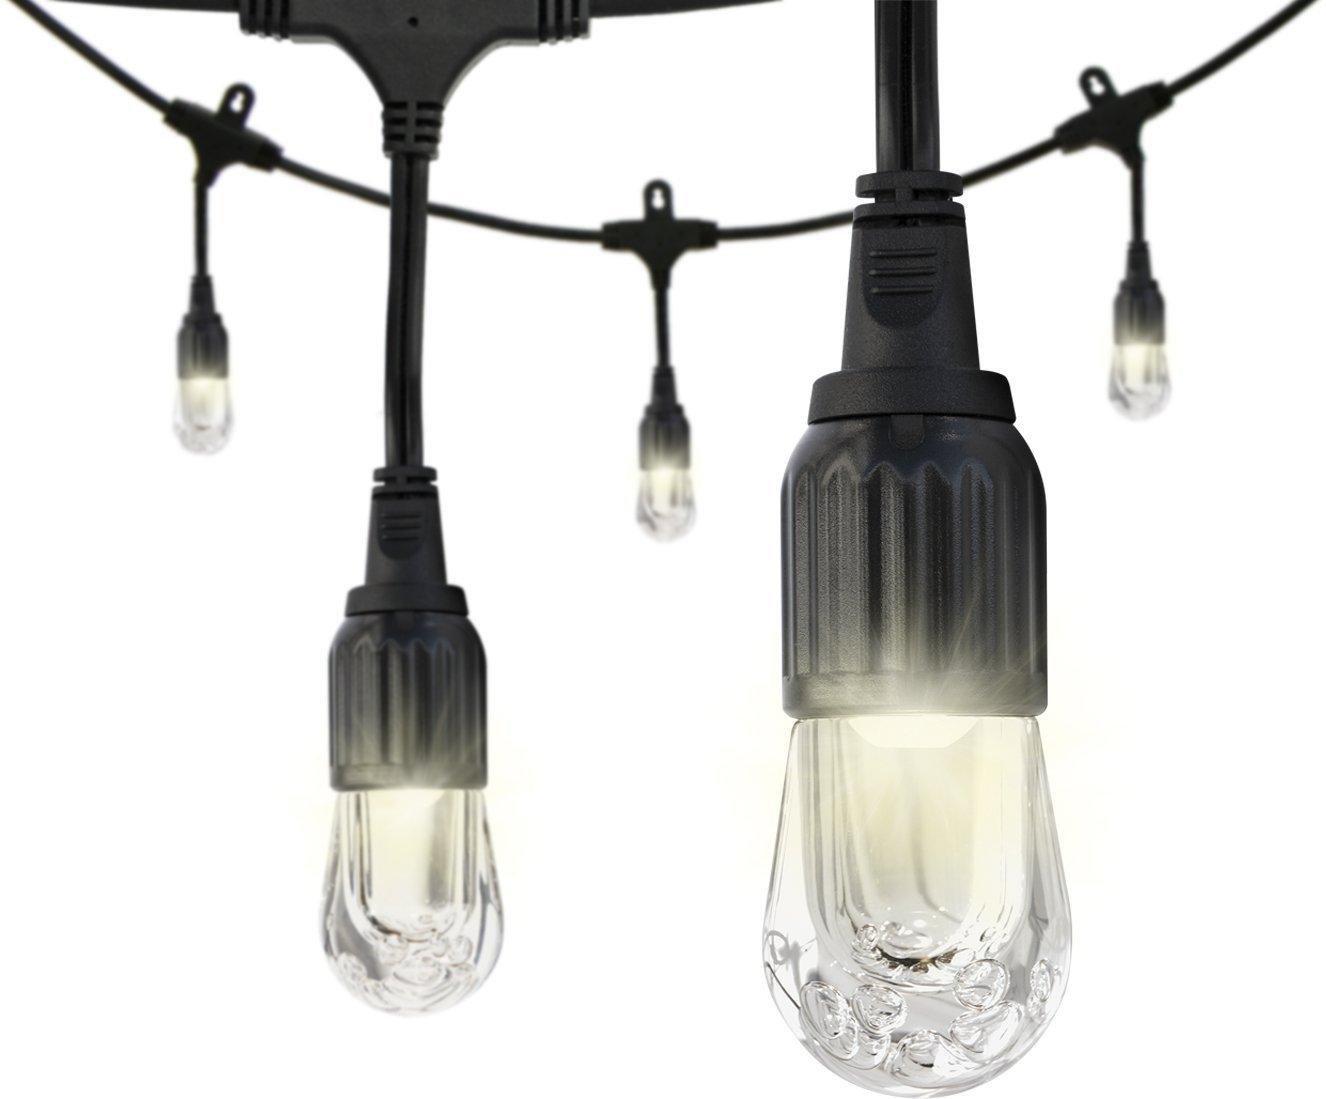 Amazon.com: Enbrighten Cafe LED String Lights (36 ft.), Premium, Commercial Grade, Lifetime ...